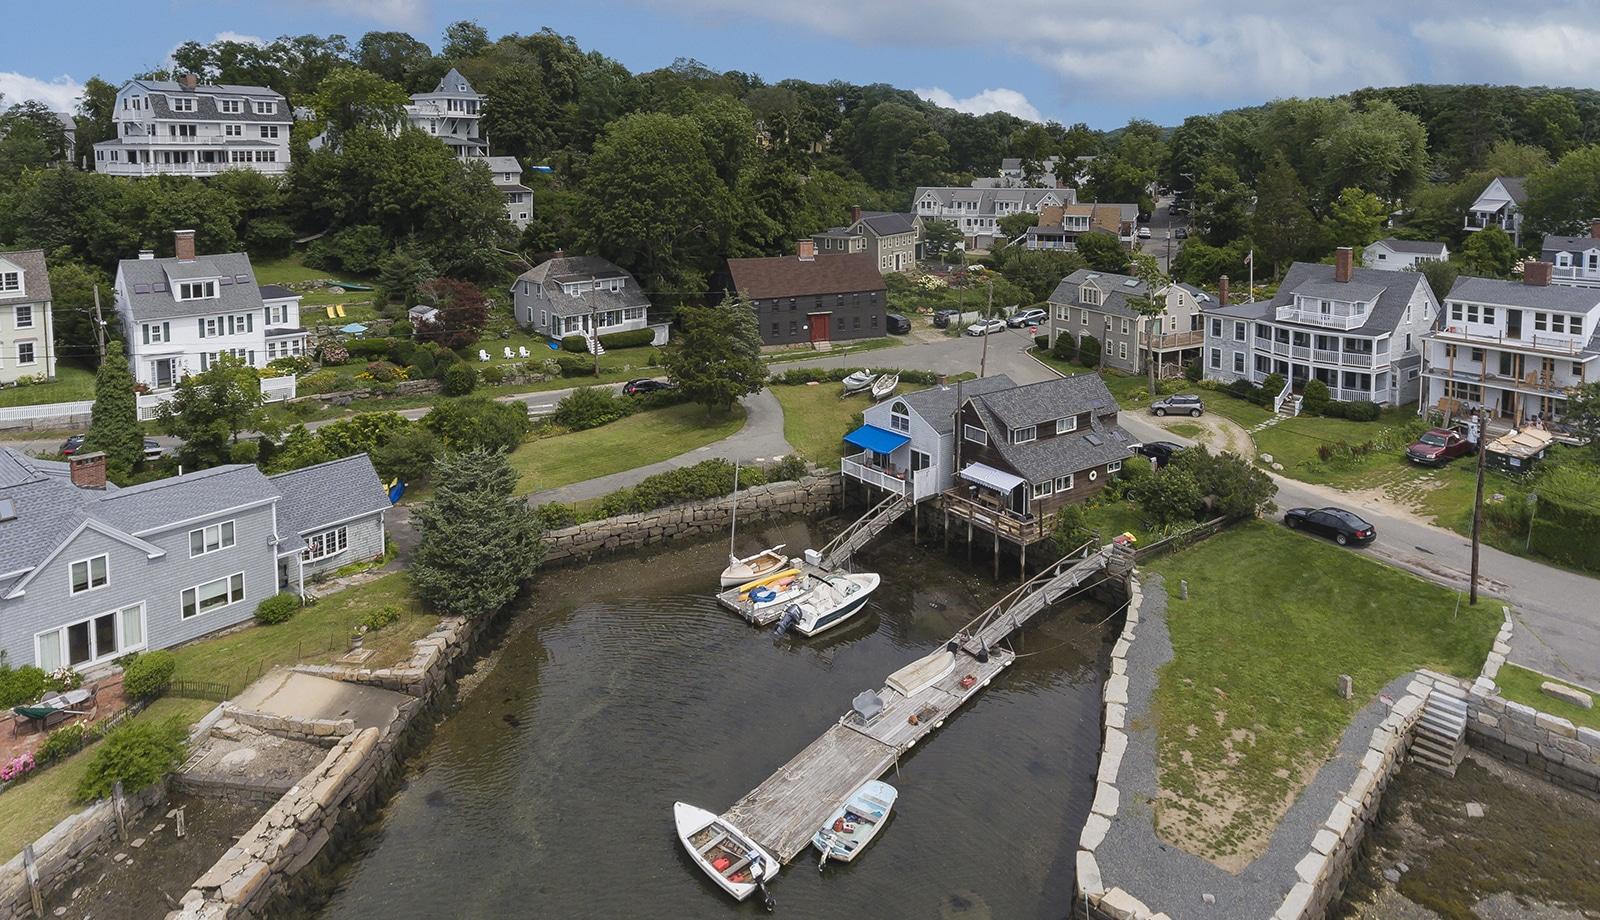 Harreden House Annisquam MA Aerial View Featured